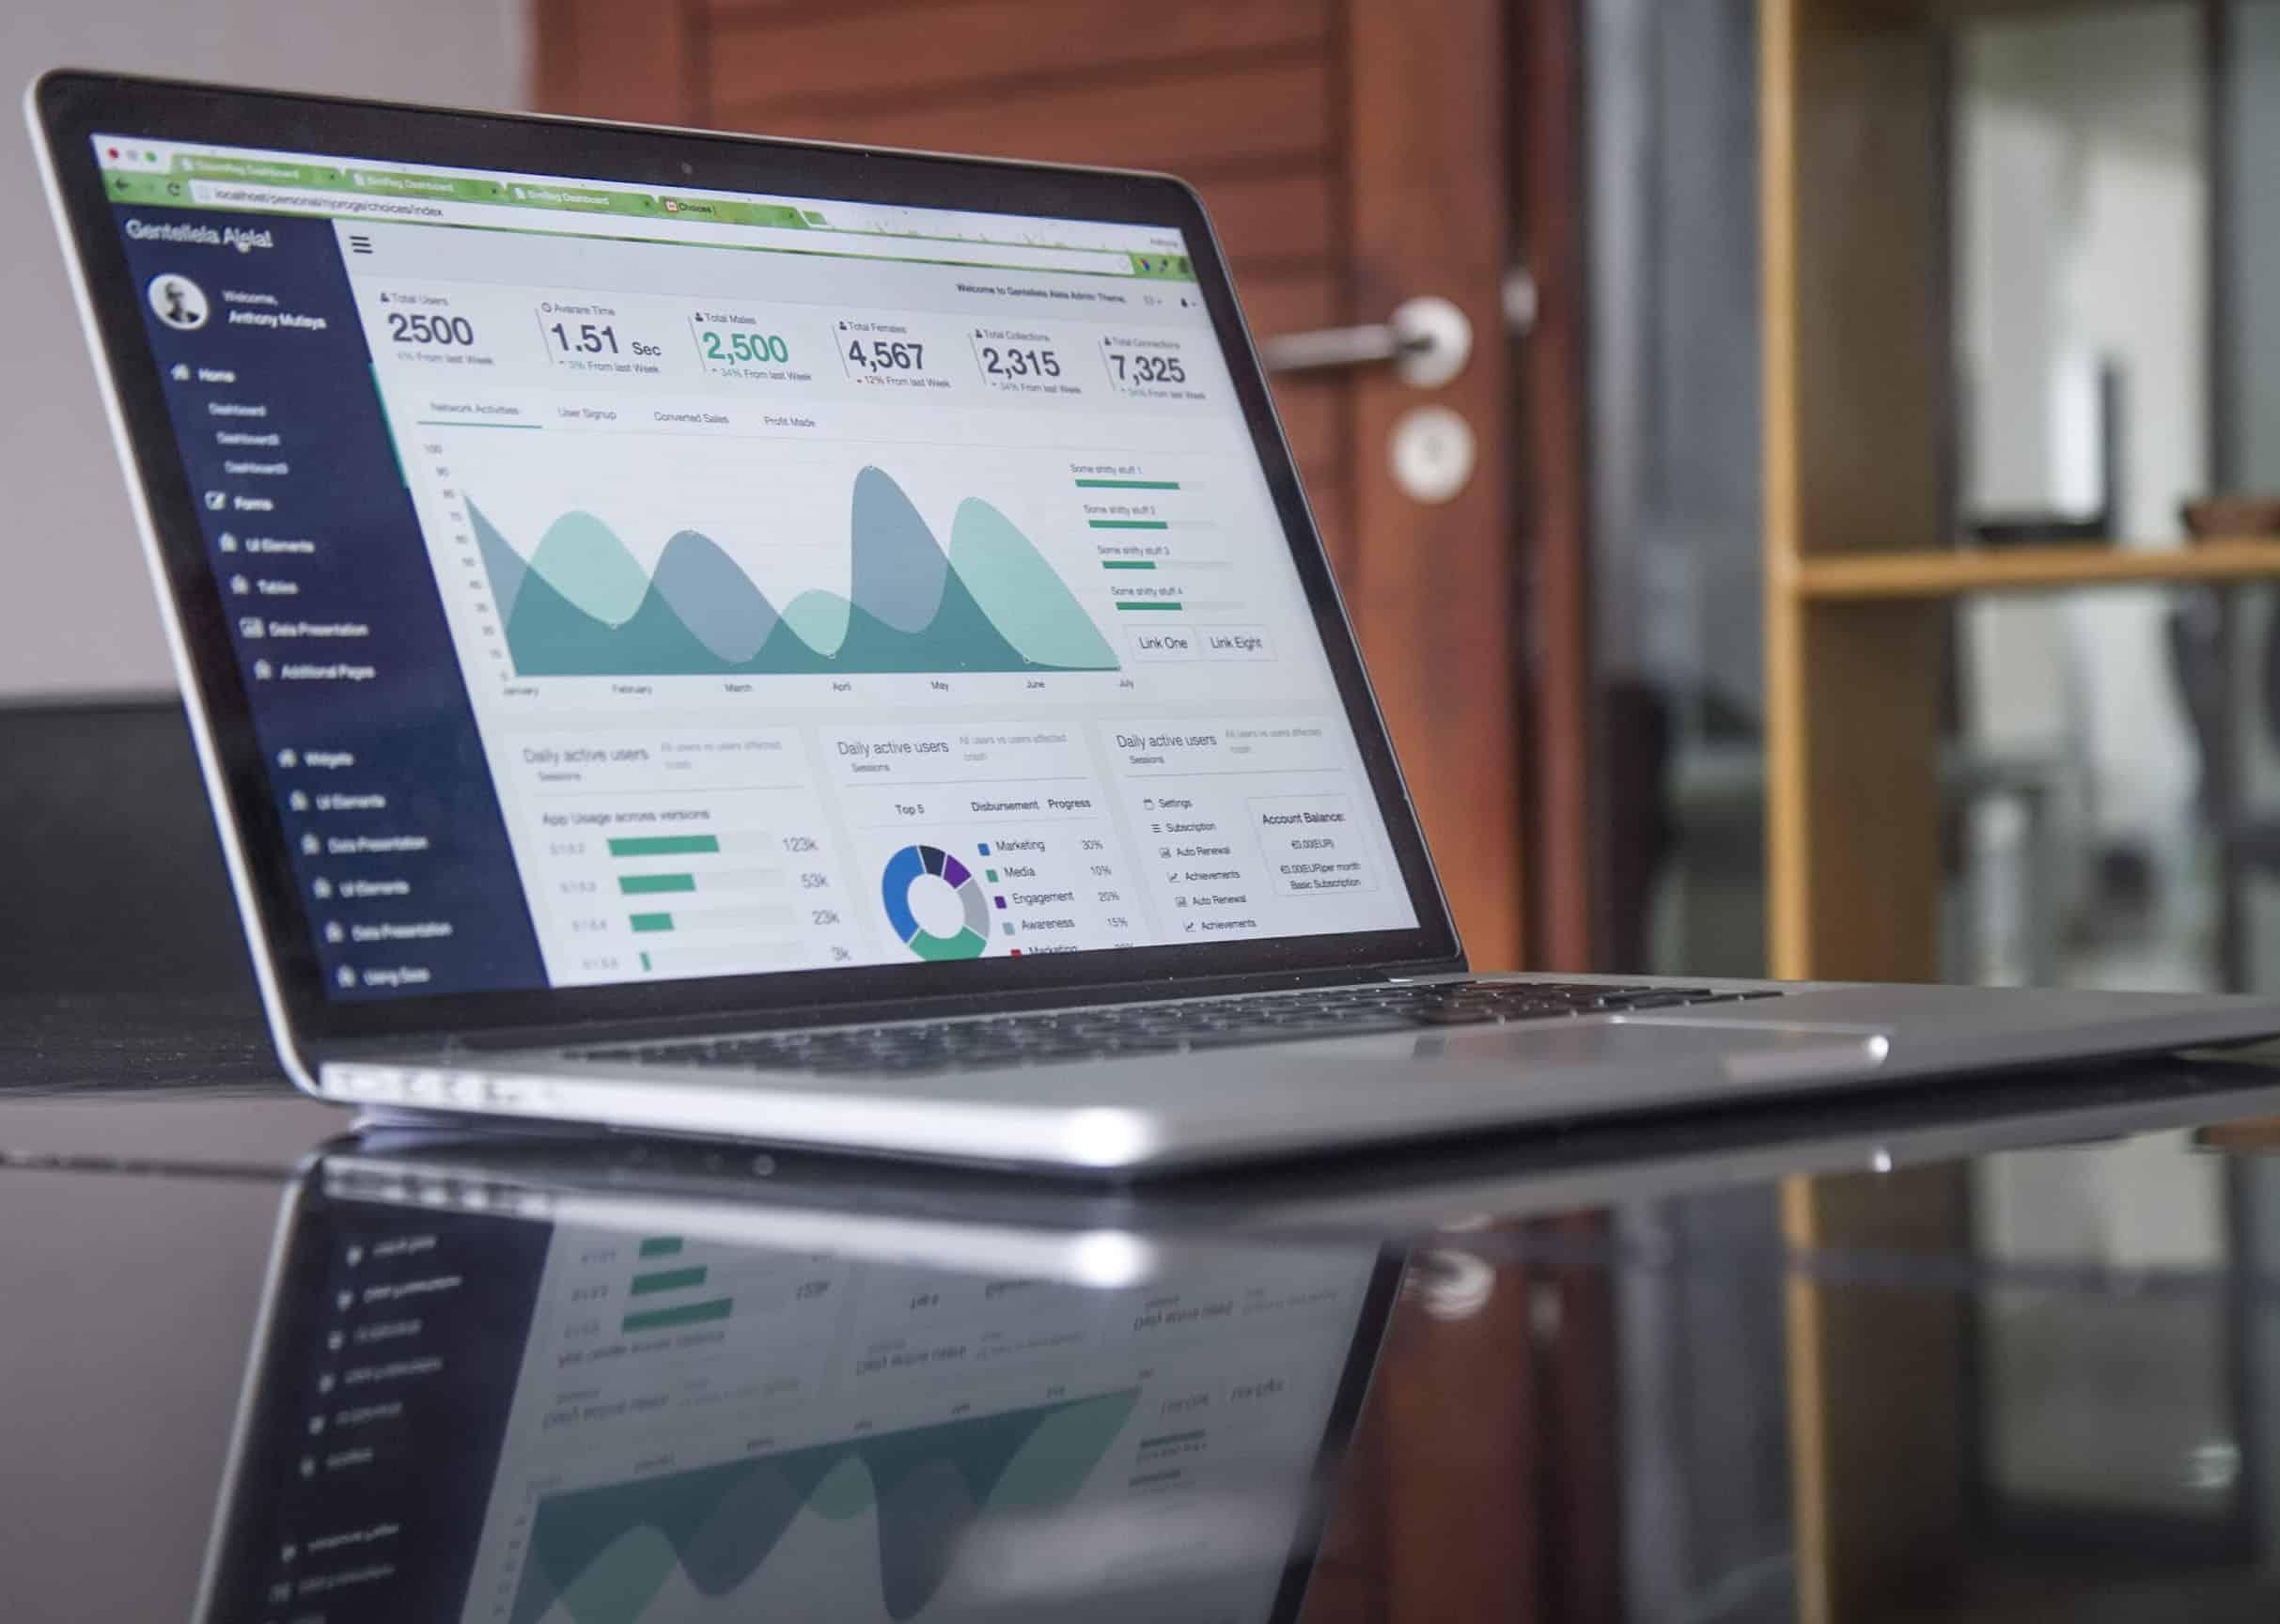 carlos-muza-Google Analytics display on a Macbook pro laptop-unsplash